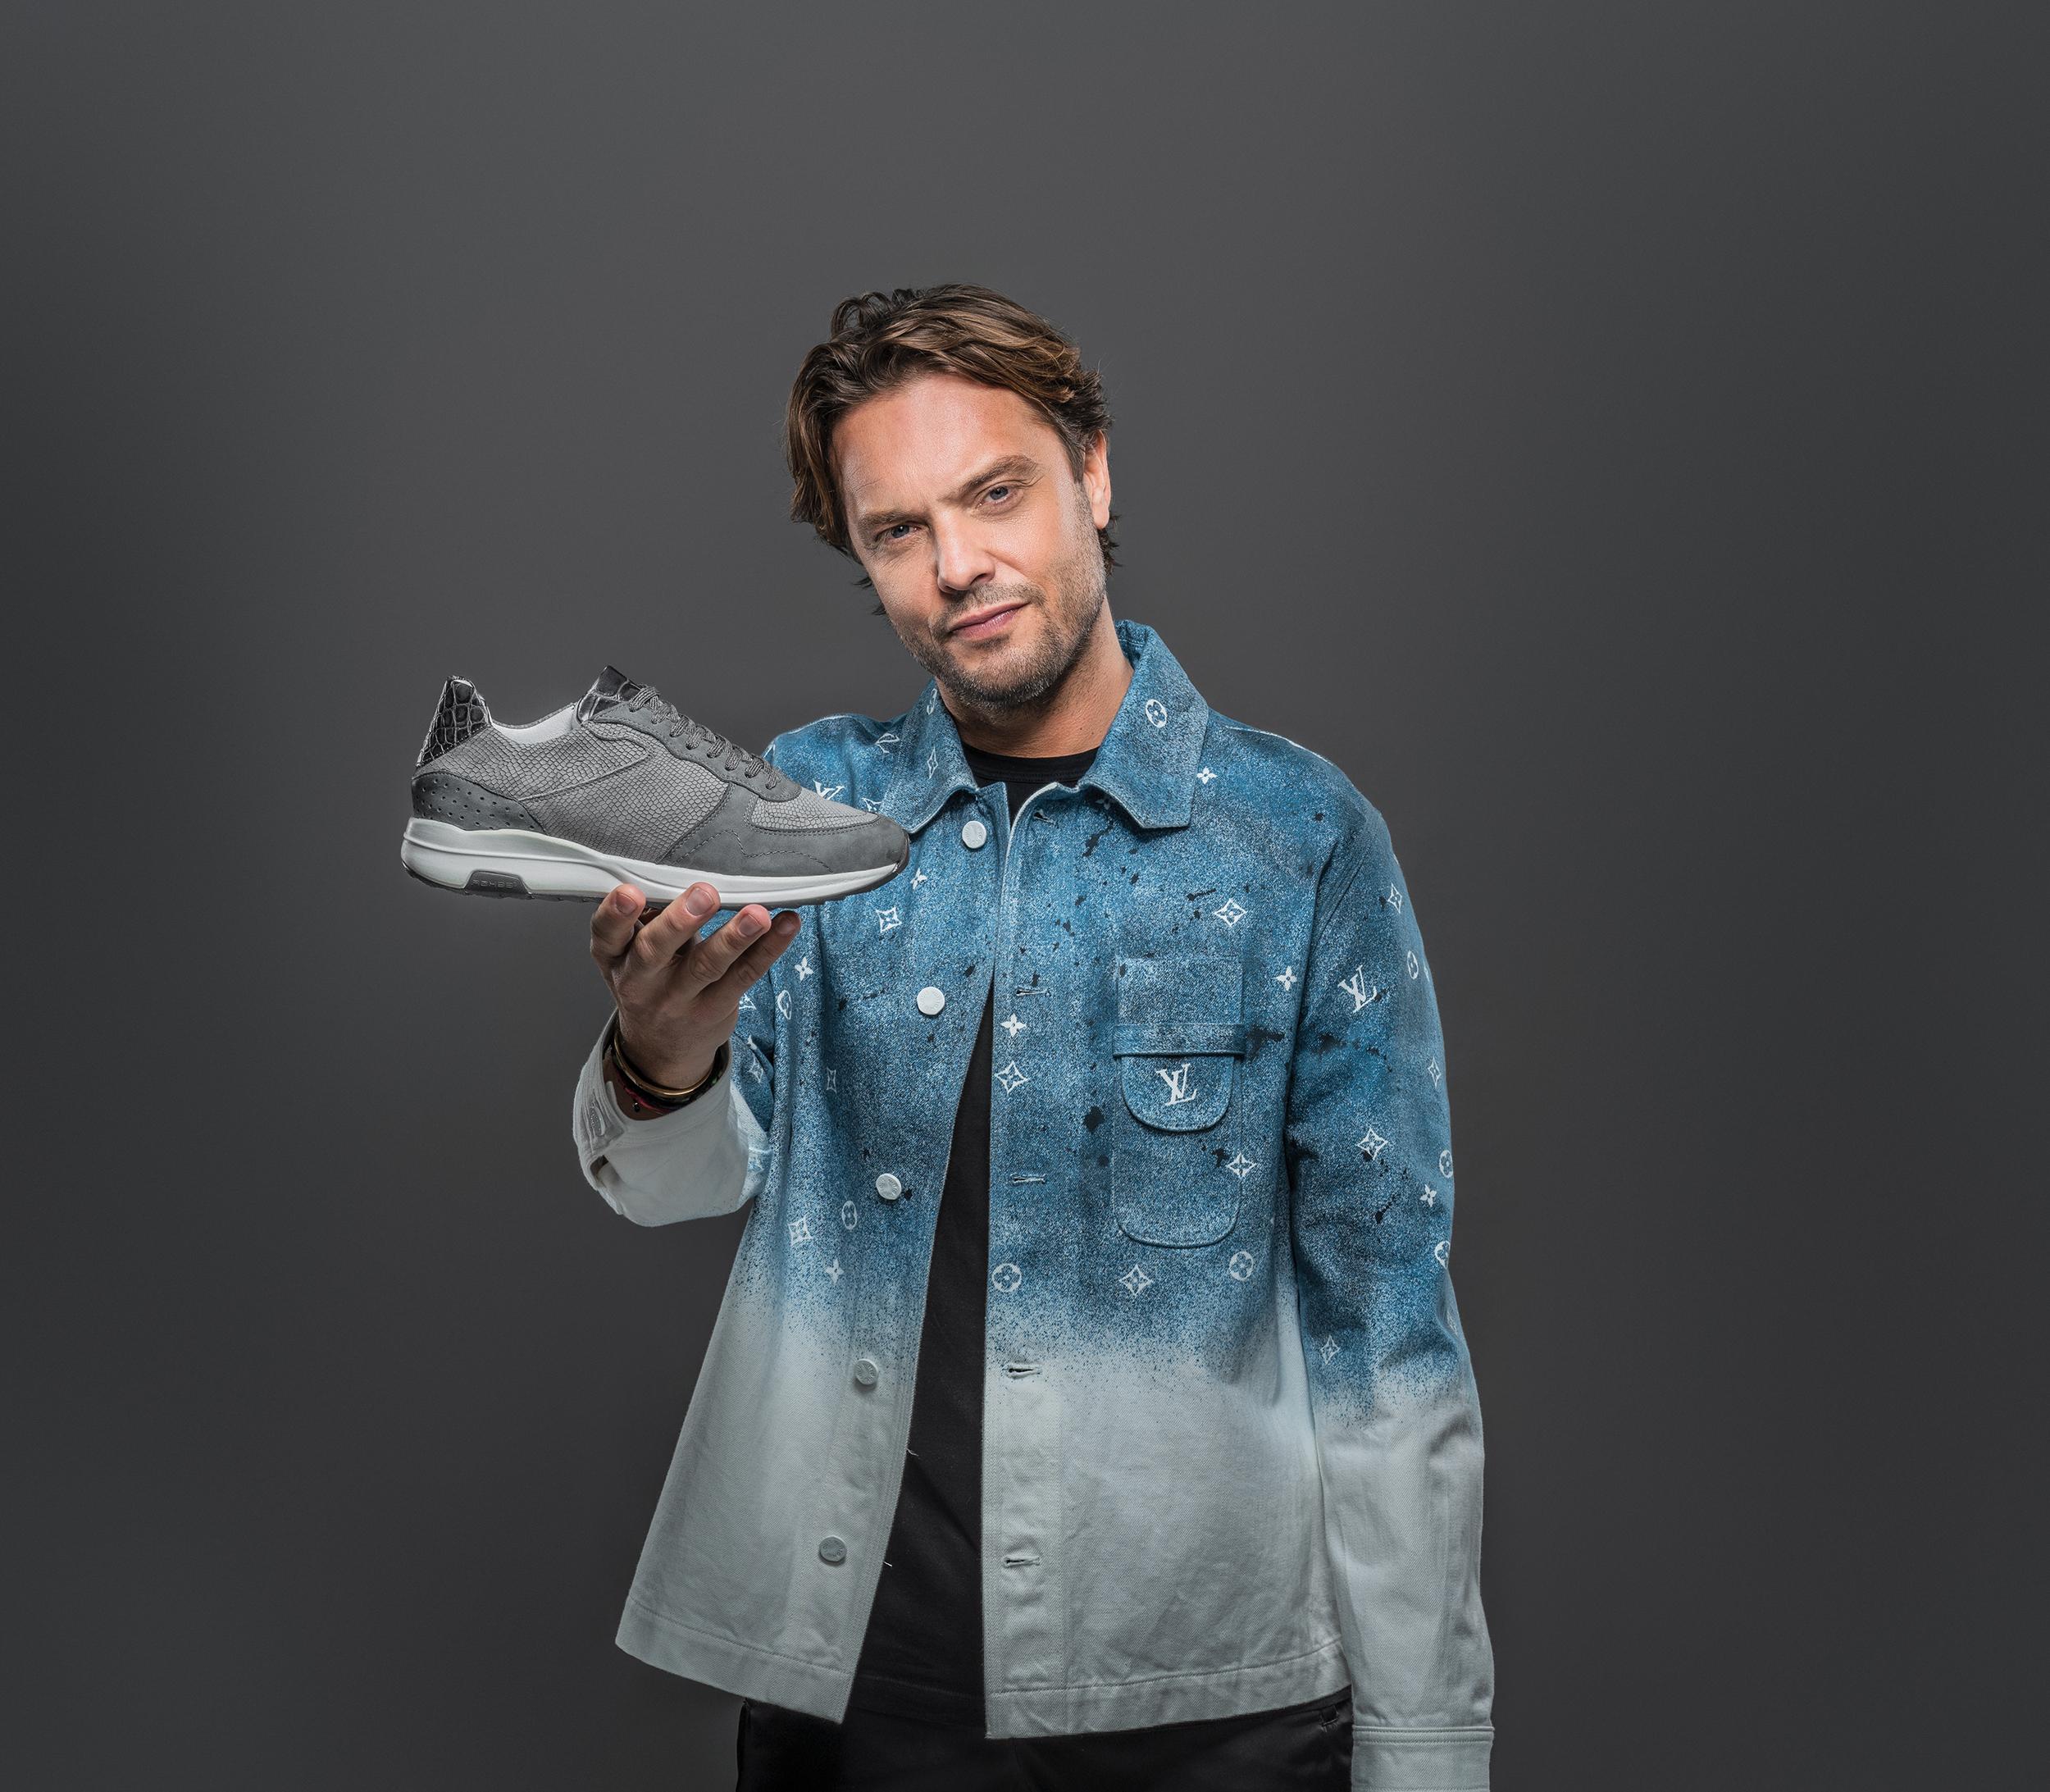 bas-smit-rehab-sneaker-hunter